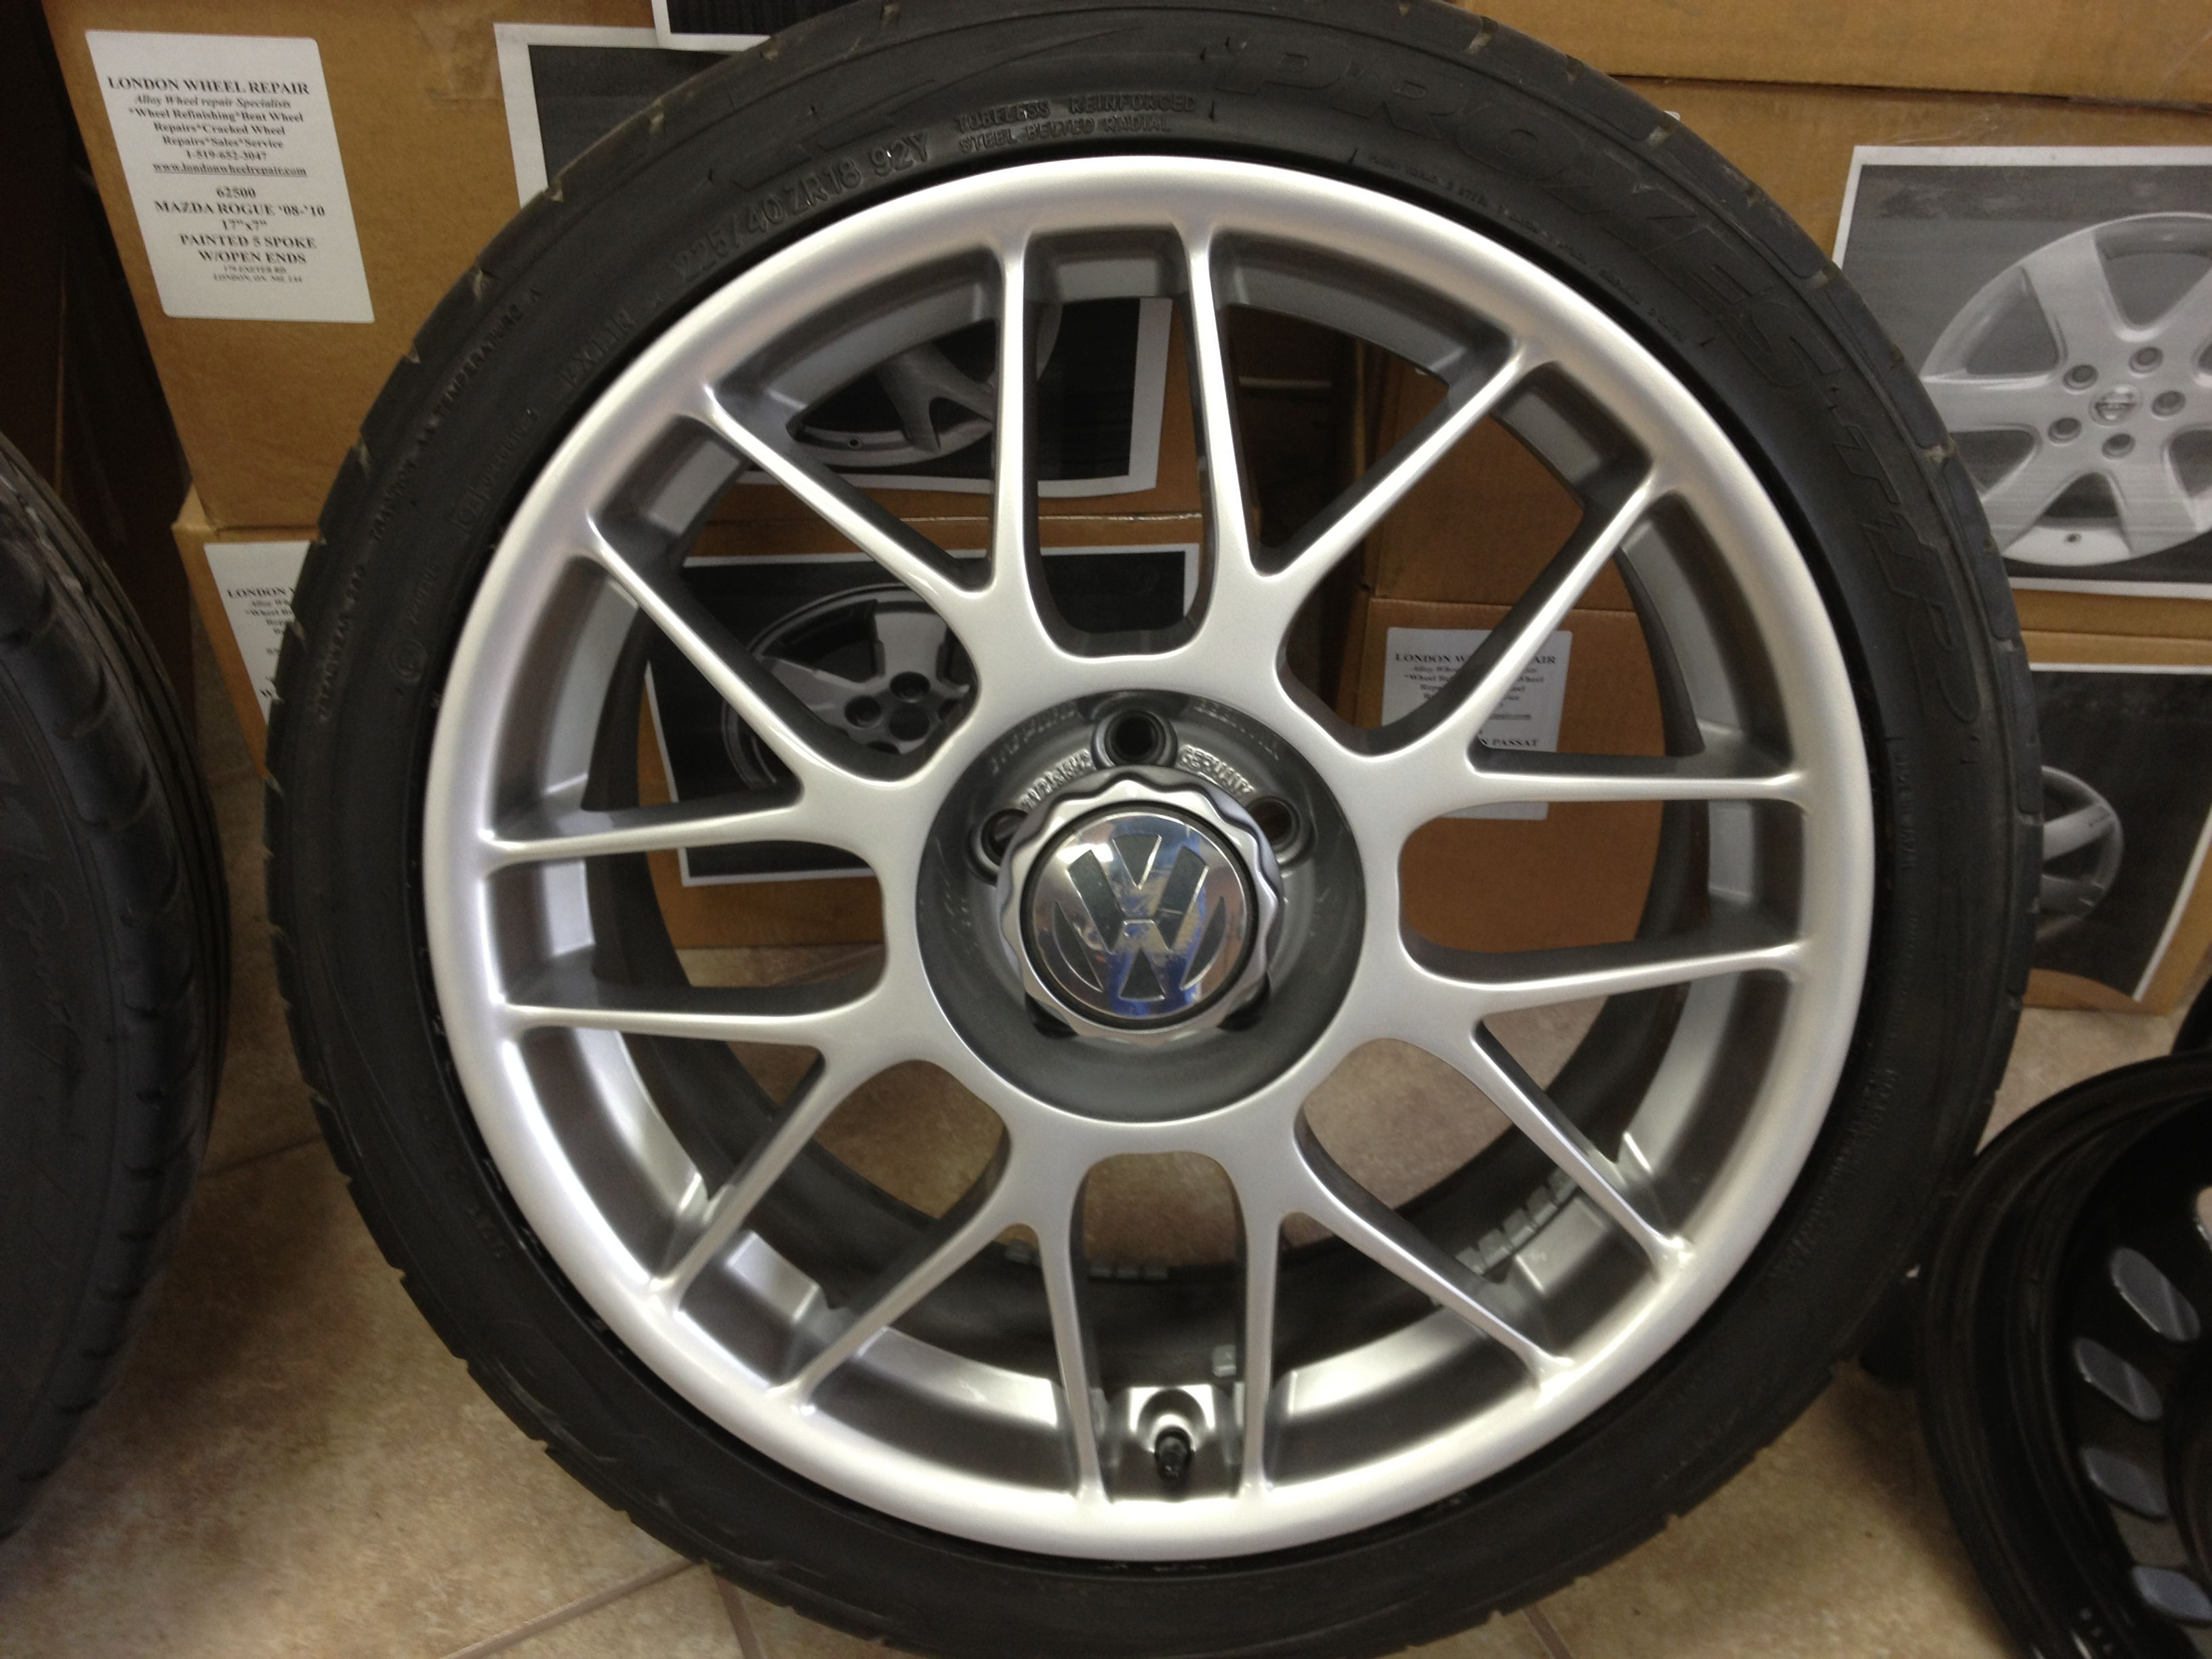 Vw Bbs Wheels After Being Painted Hyper Silver By London Wheel Repair